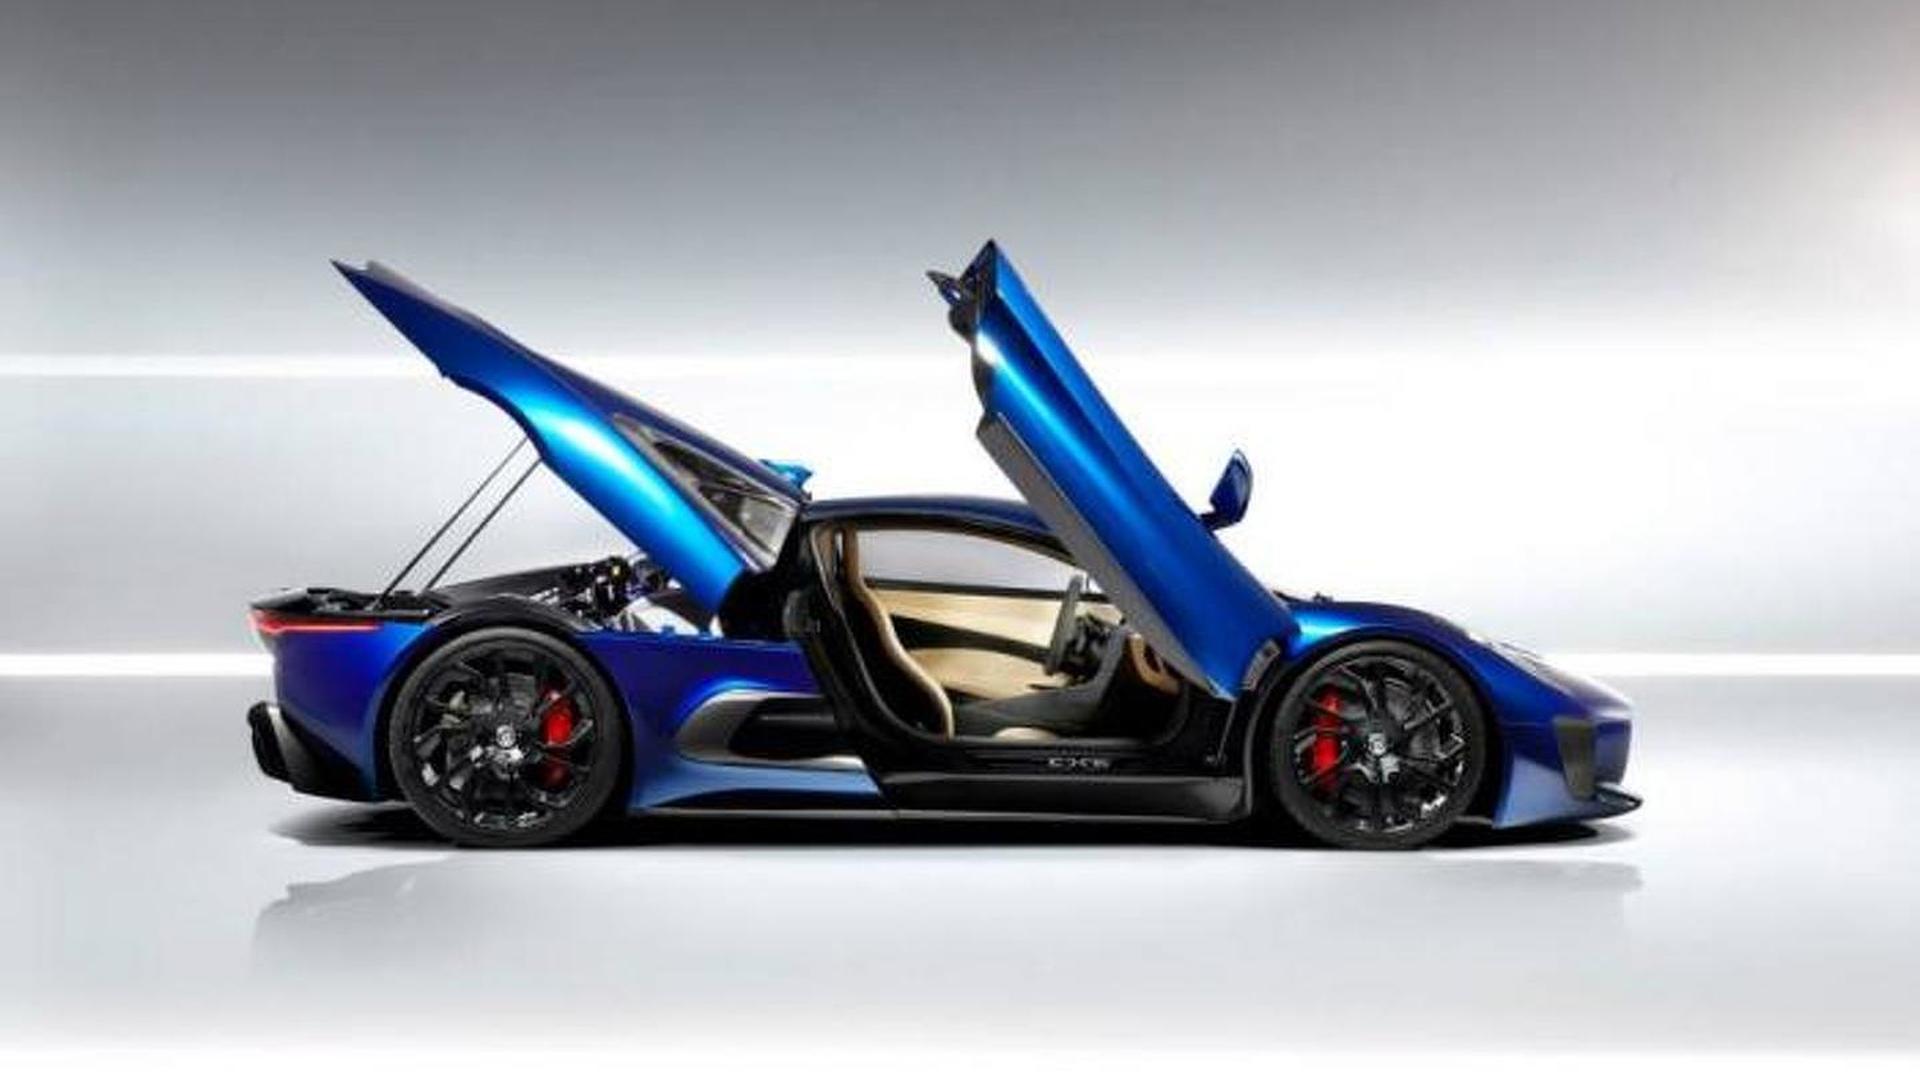 Jaguar shows off their C-X75 prototype